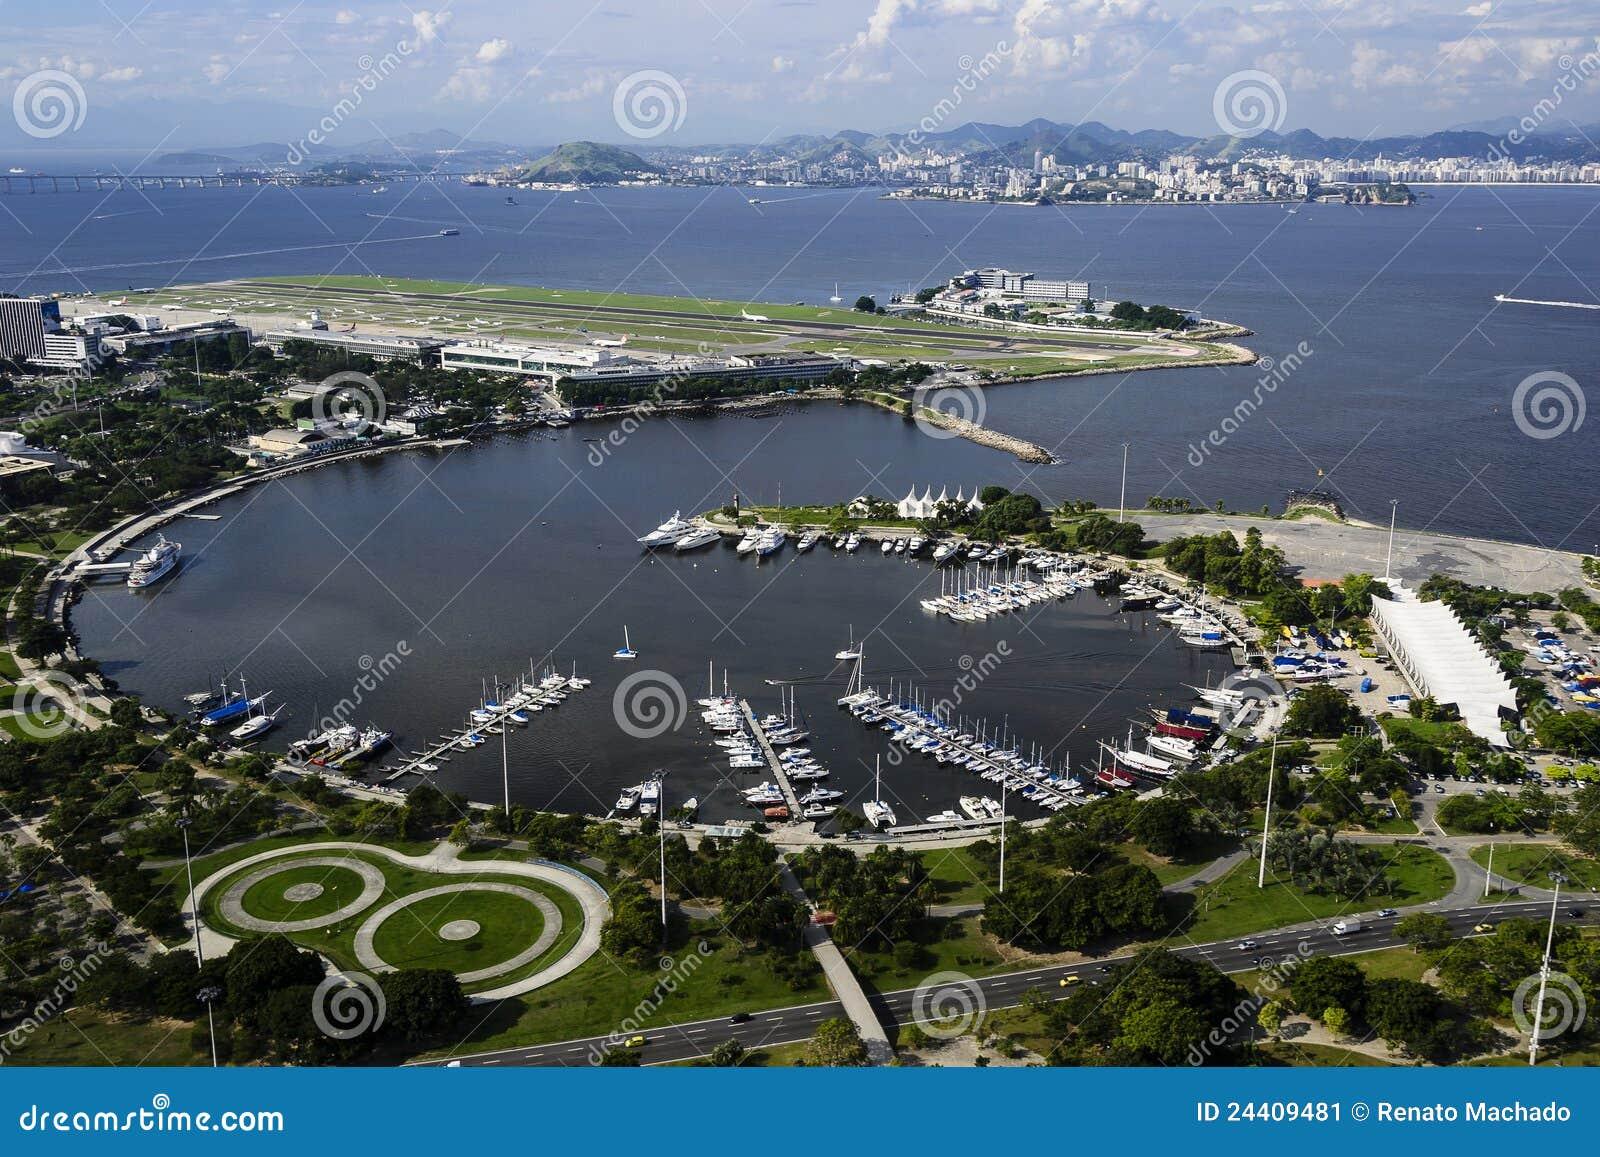 Brazil De Janeiro Rio